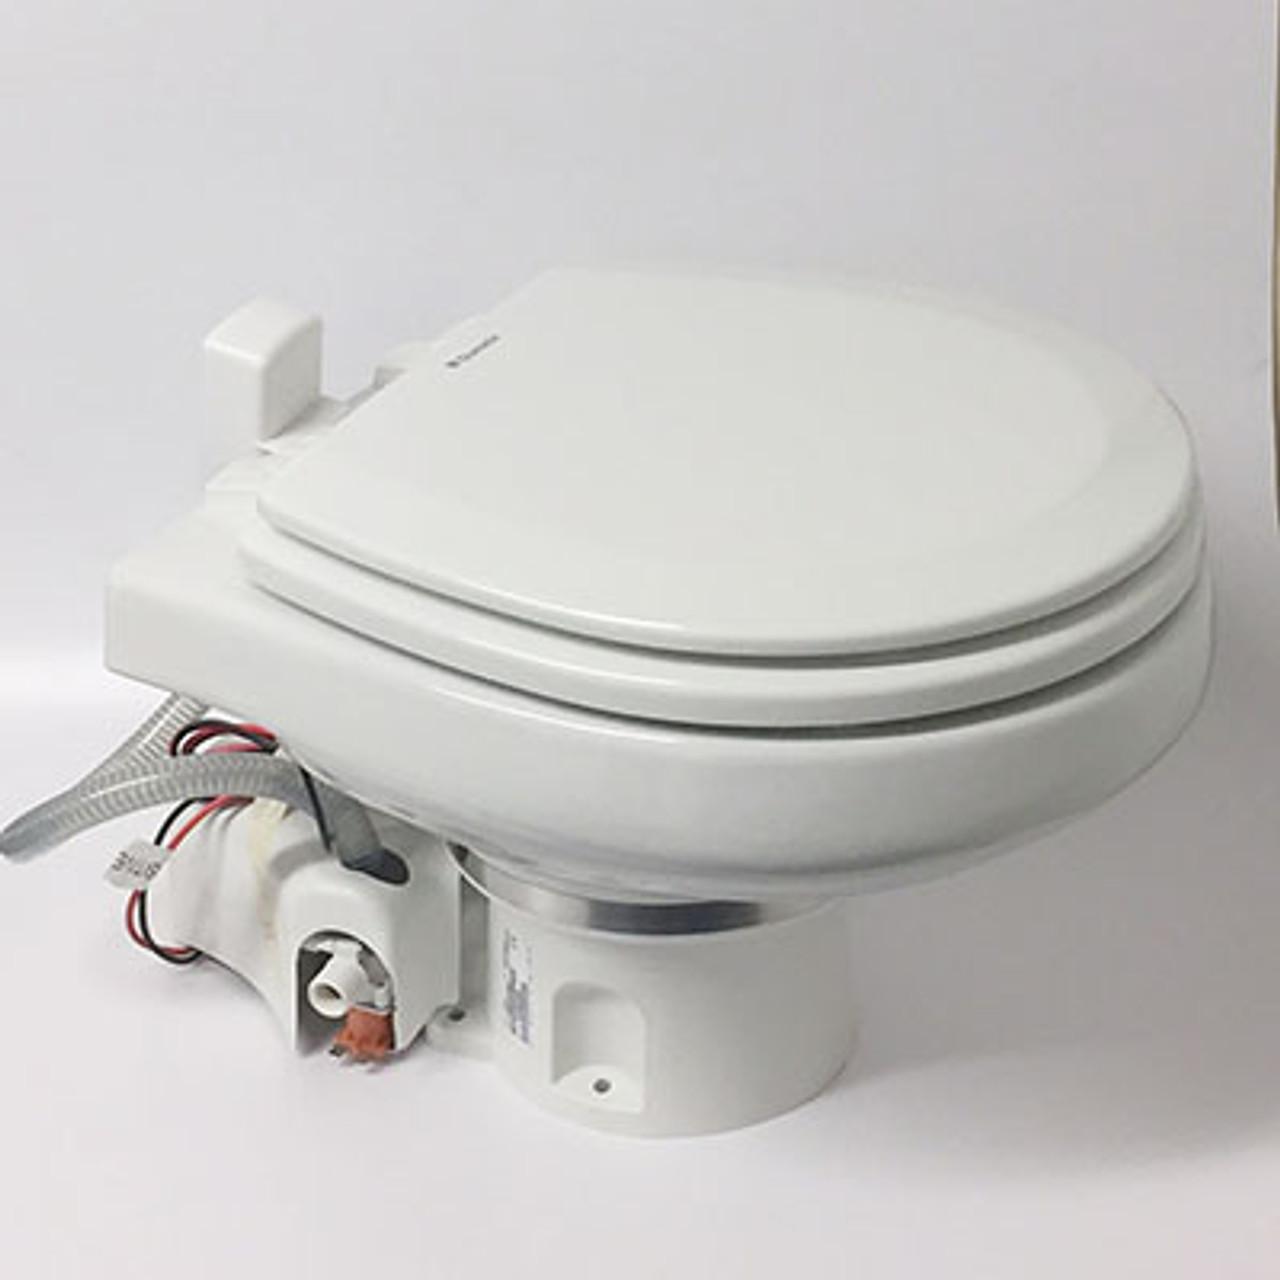 MasterFlush Freshwater Orbit Toilets 7120, 7220